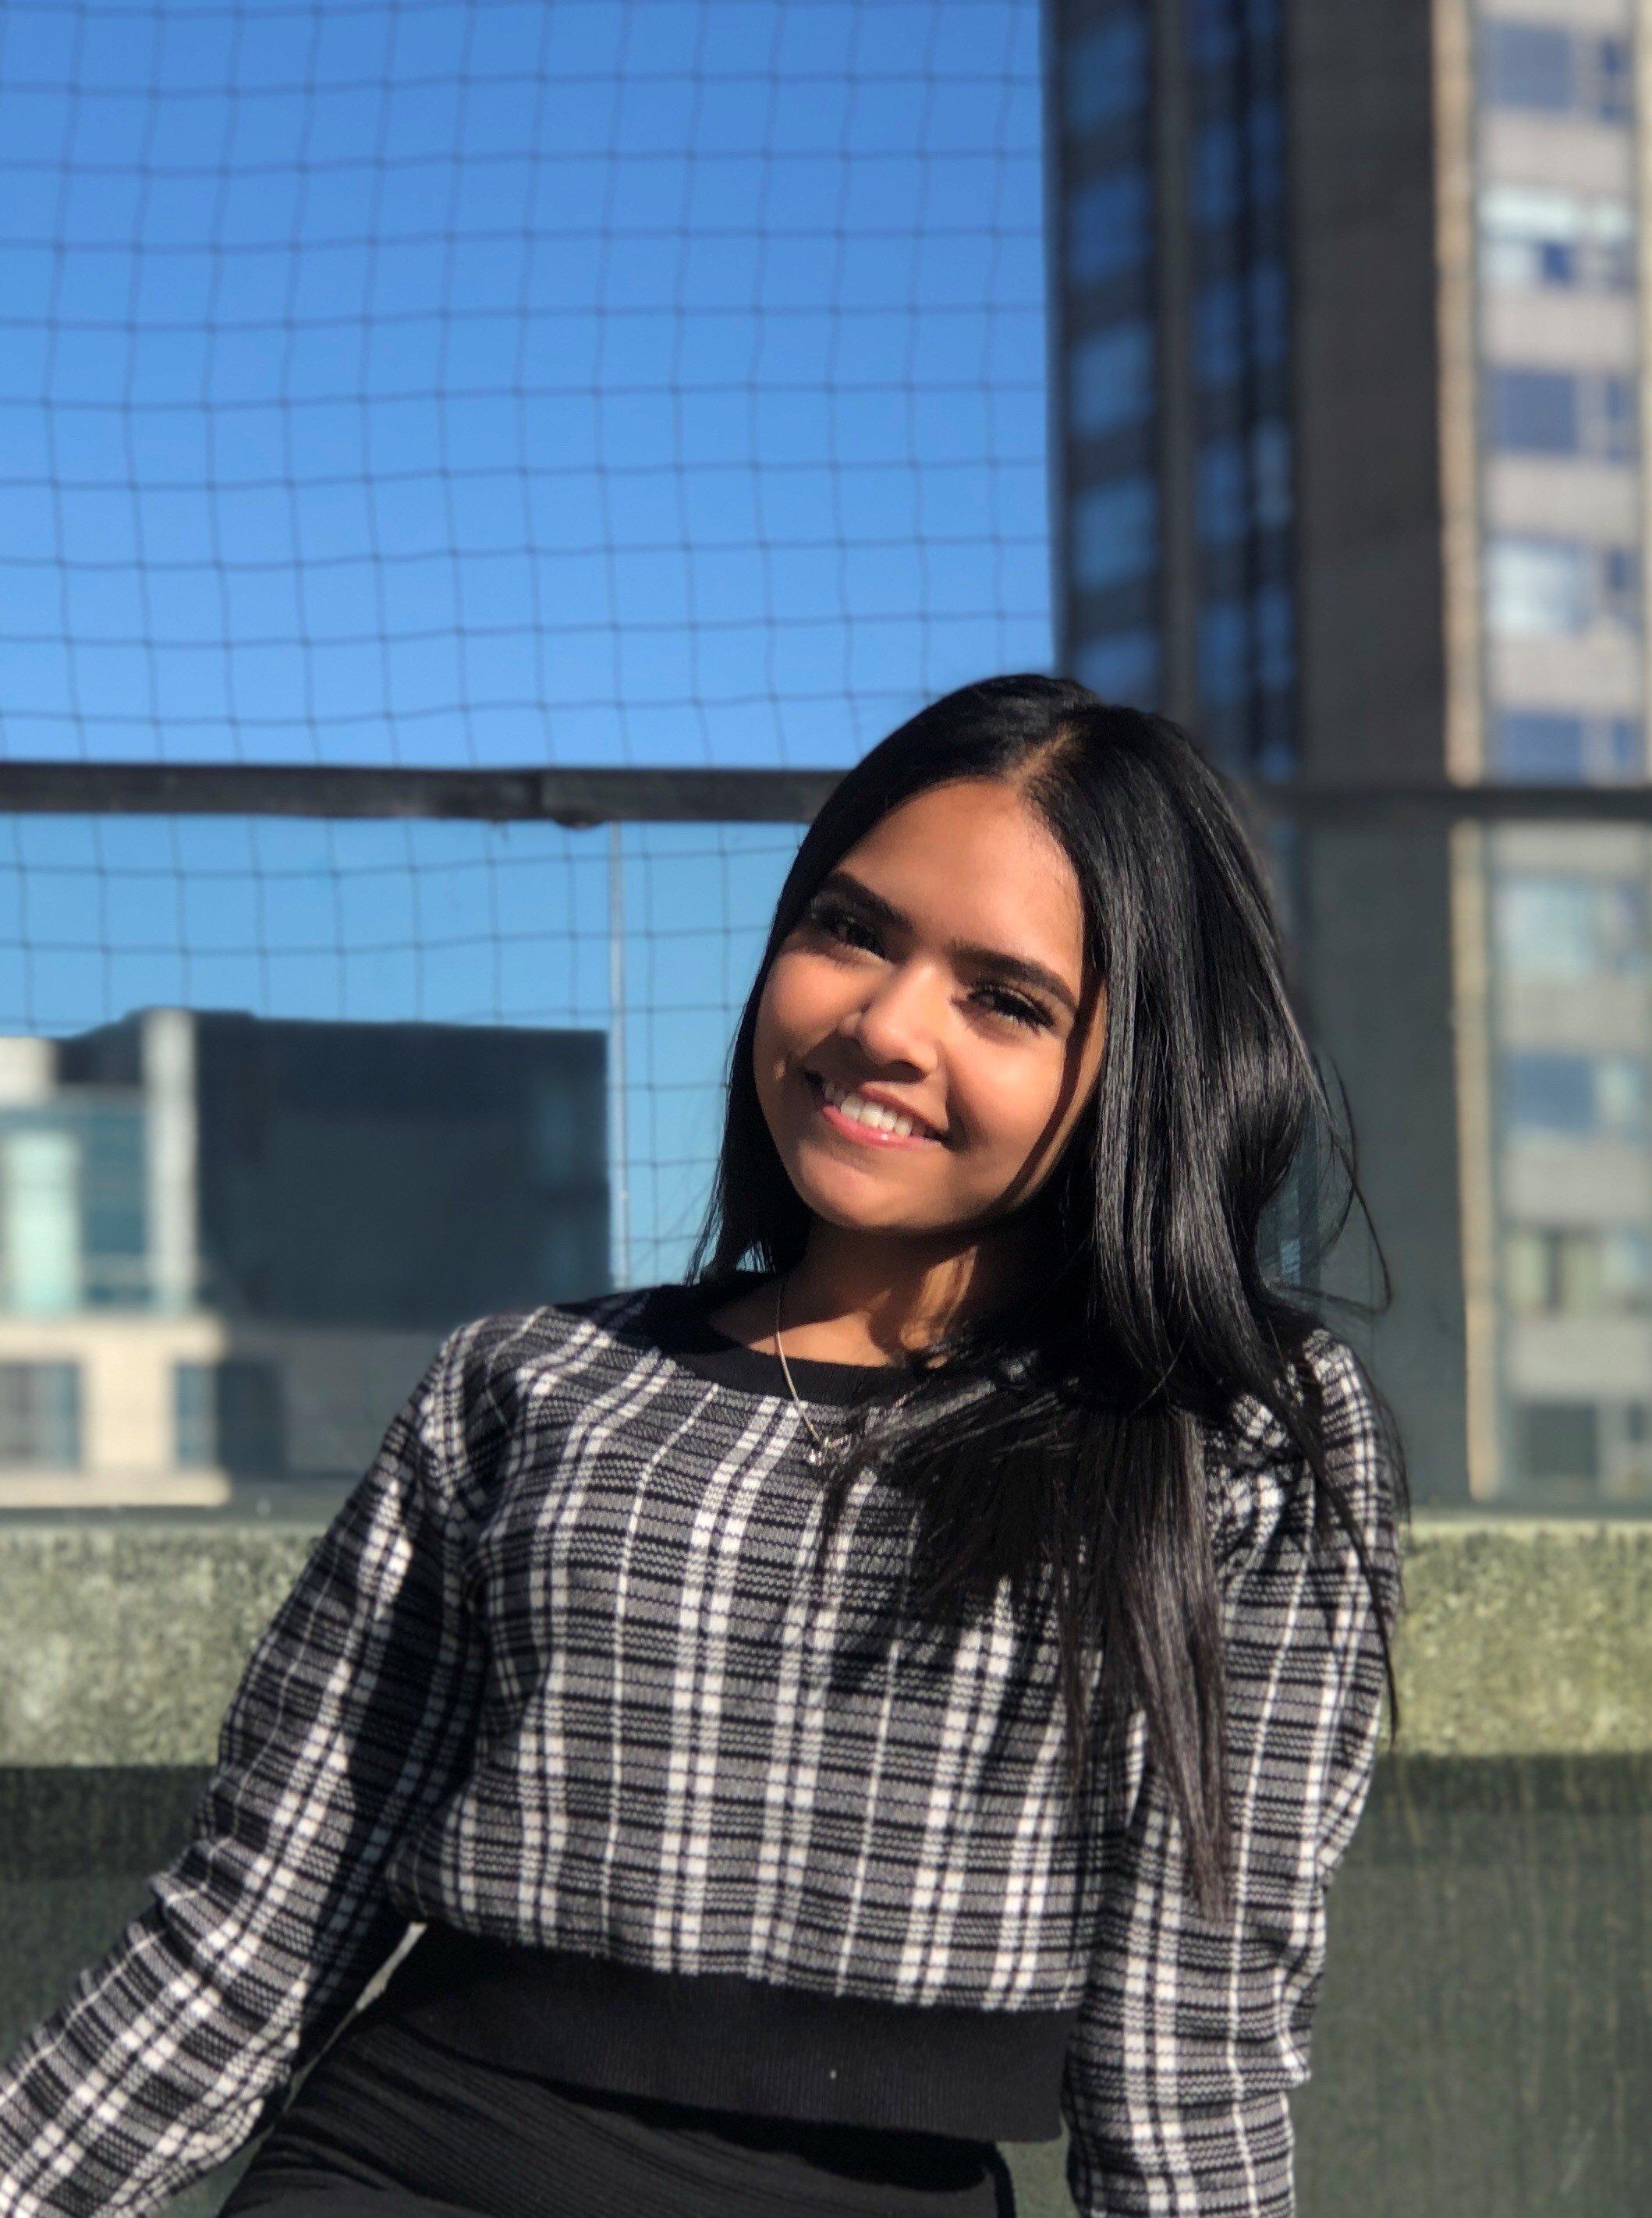 MiSP Youth Ambassadors: Enaya Ali